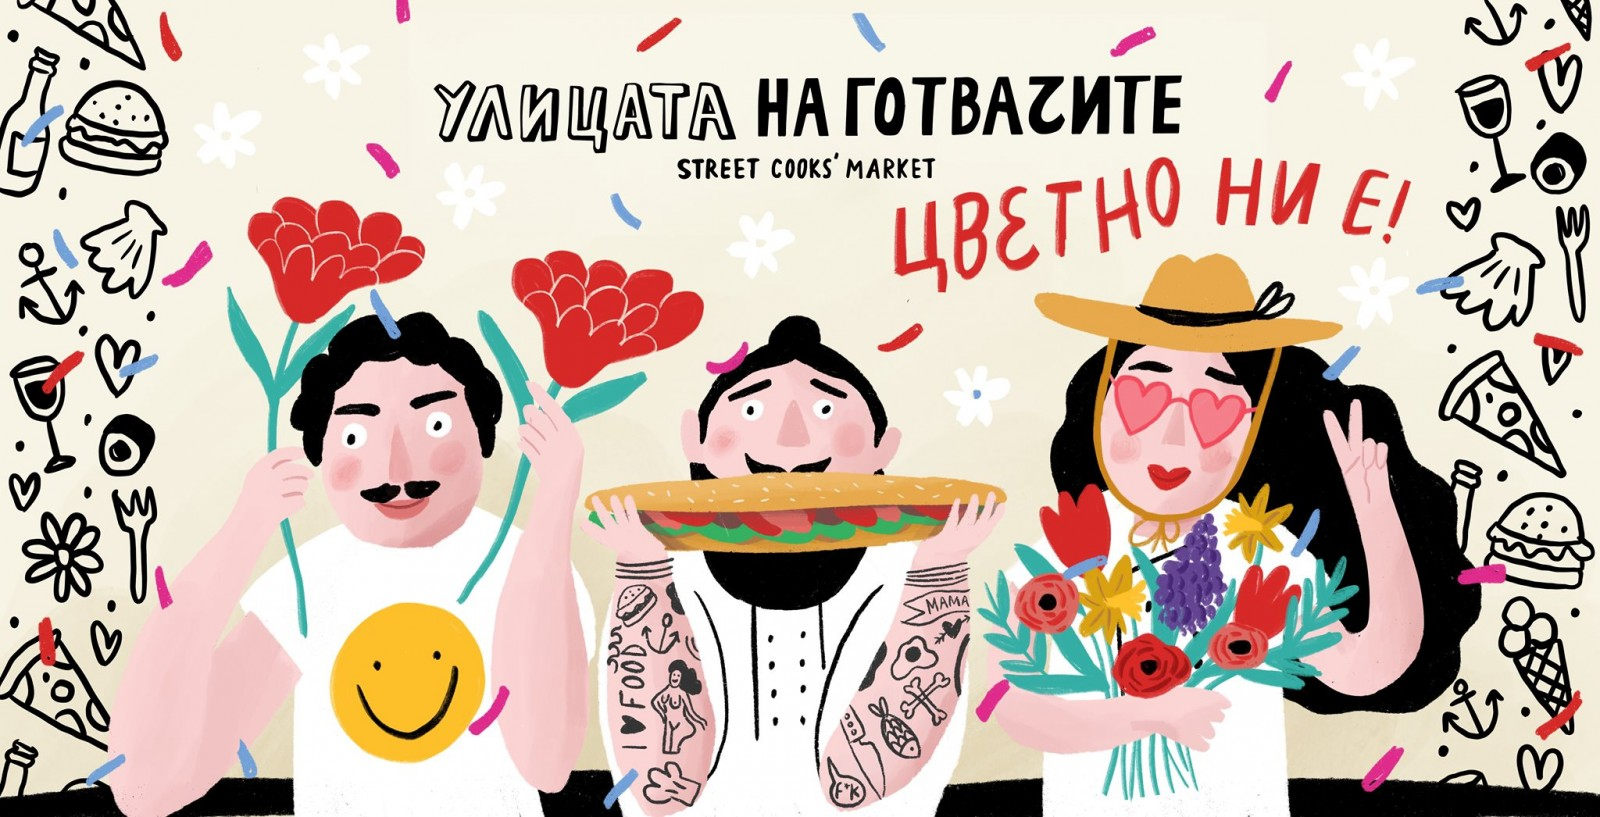 Street cooks' market